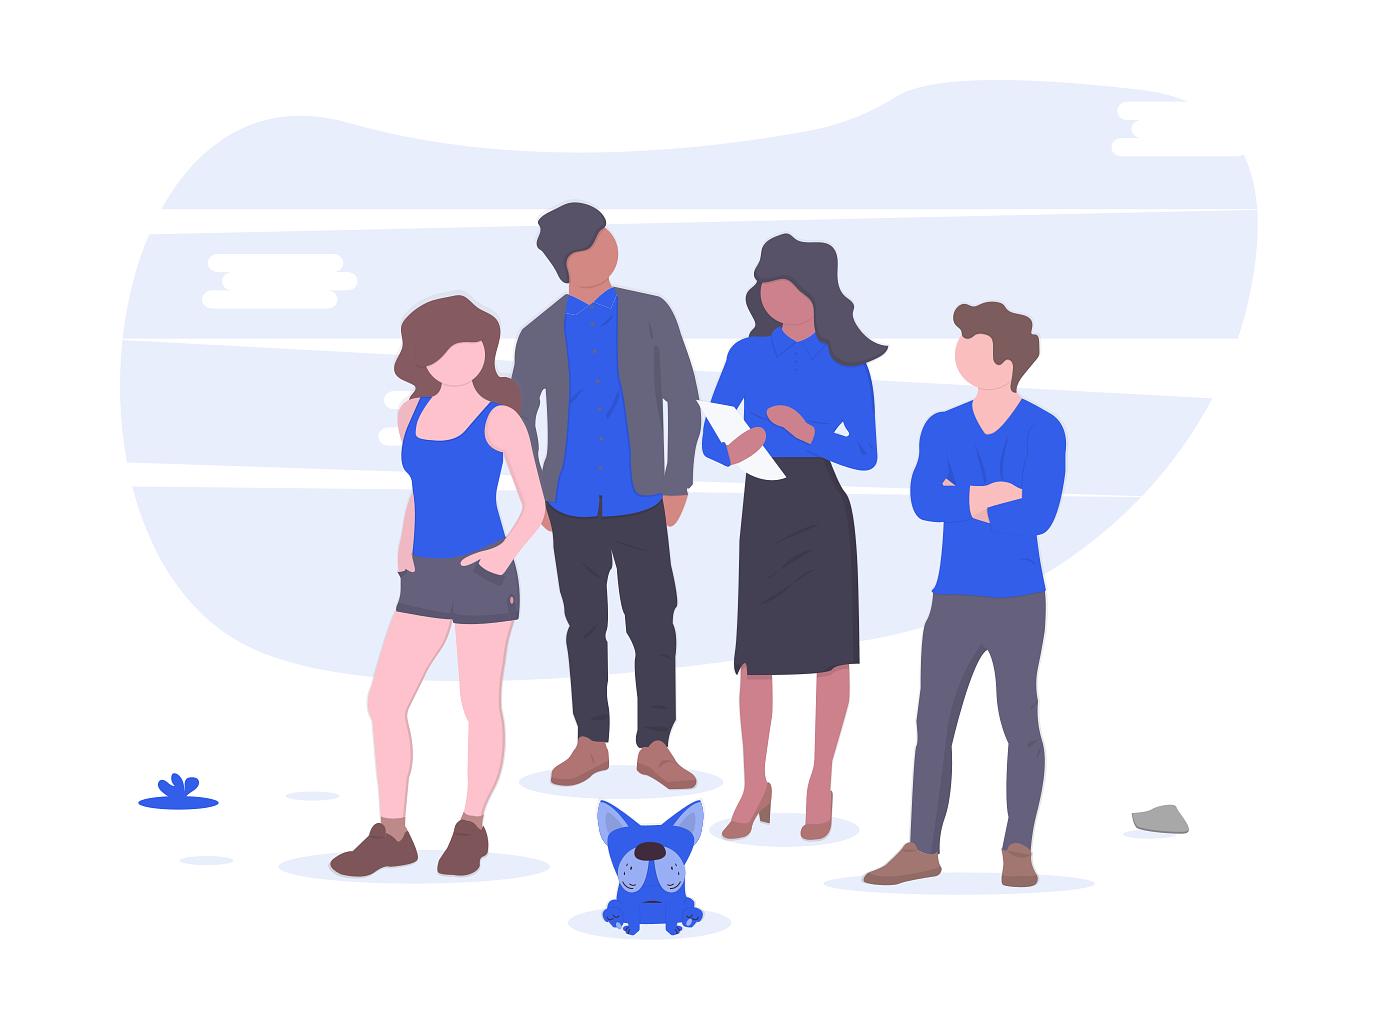 illustration of team